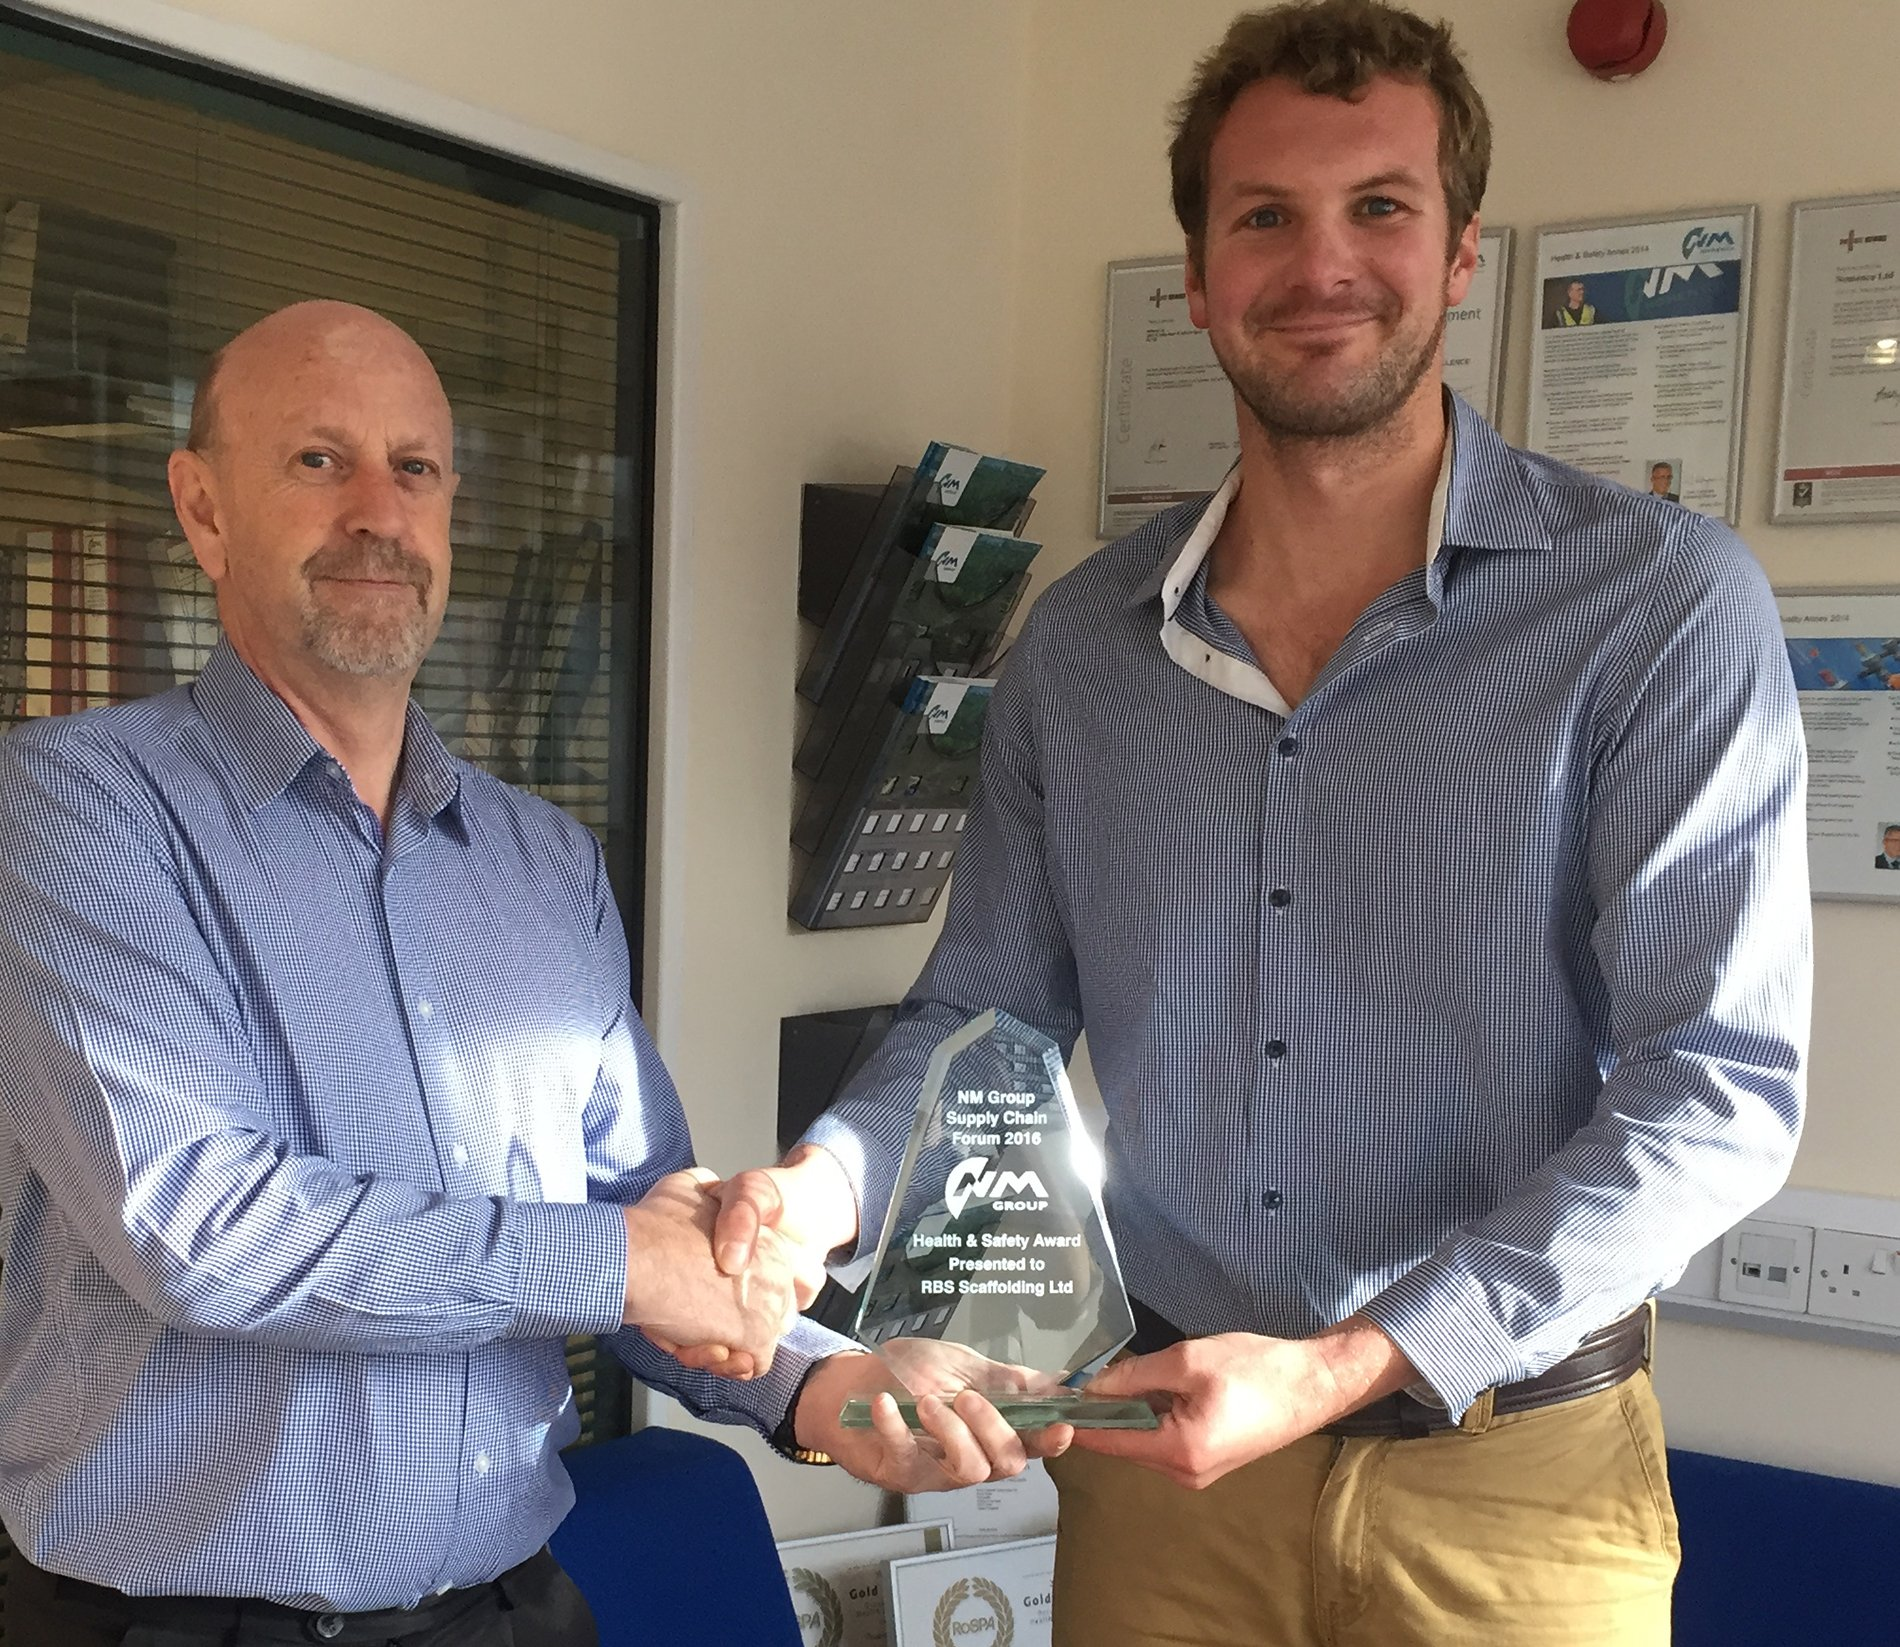 Award Winning Devon scaffolding company